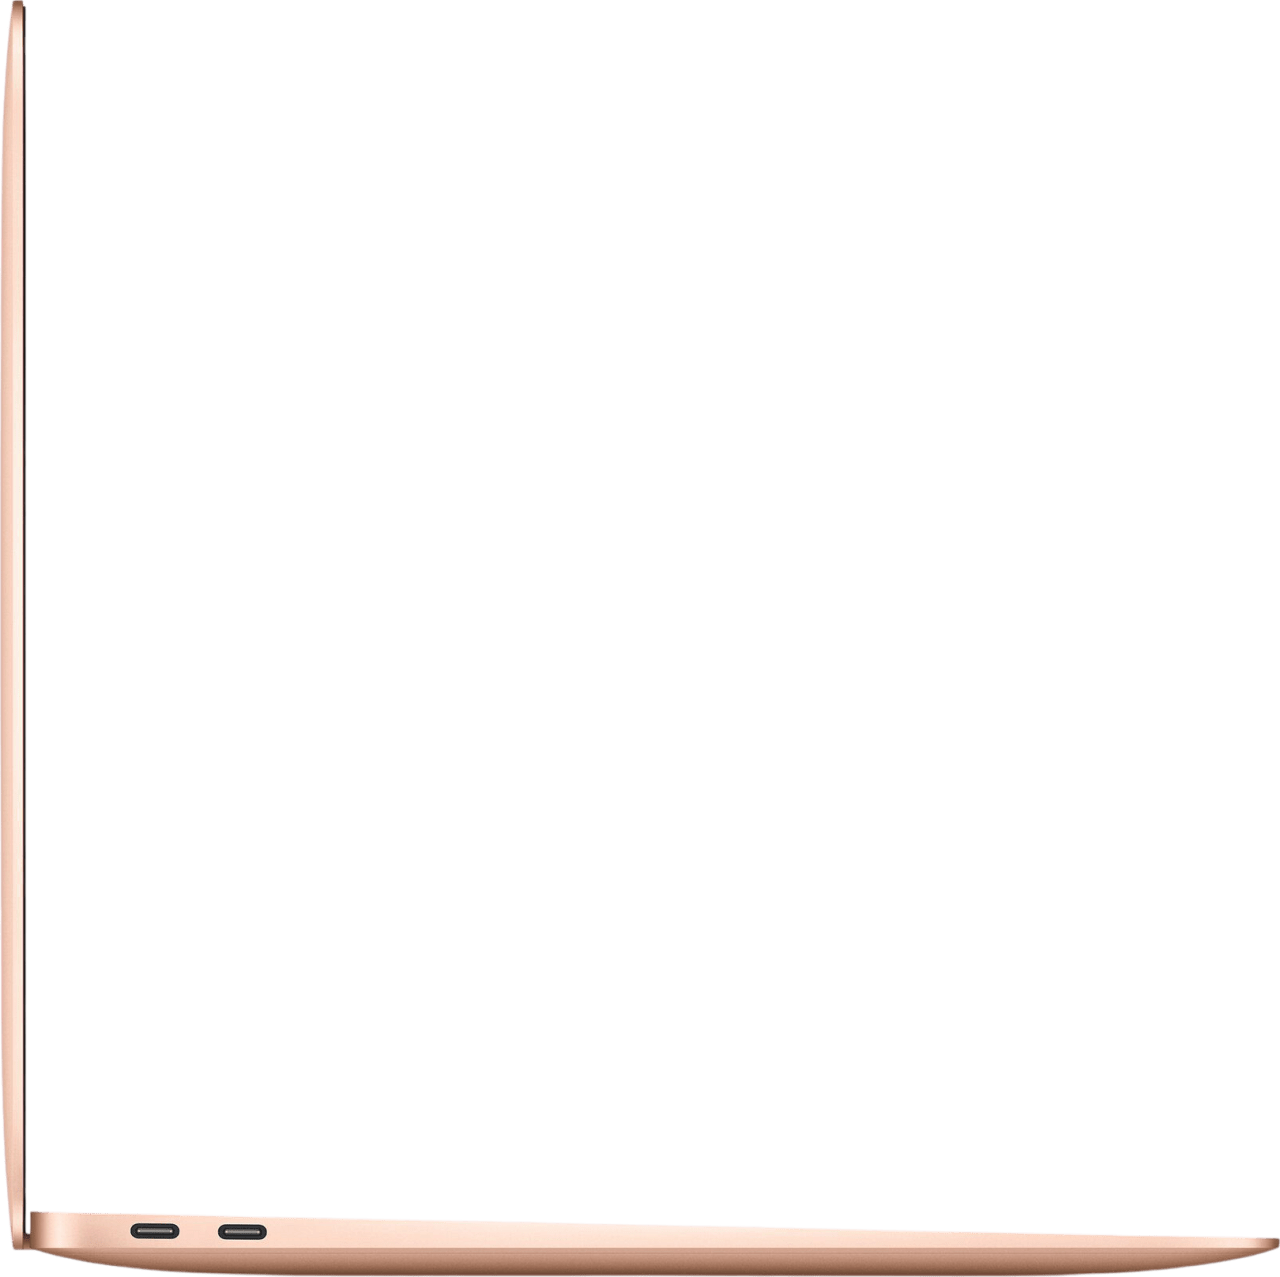 Gold Apple MacBook Air (Late 2020) - English (QWERTY) Laptop - Apple M1 - 8GB - 512GB SSD - Apple Integrated 8-core GPU.3